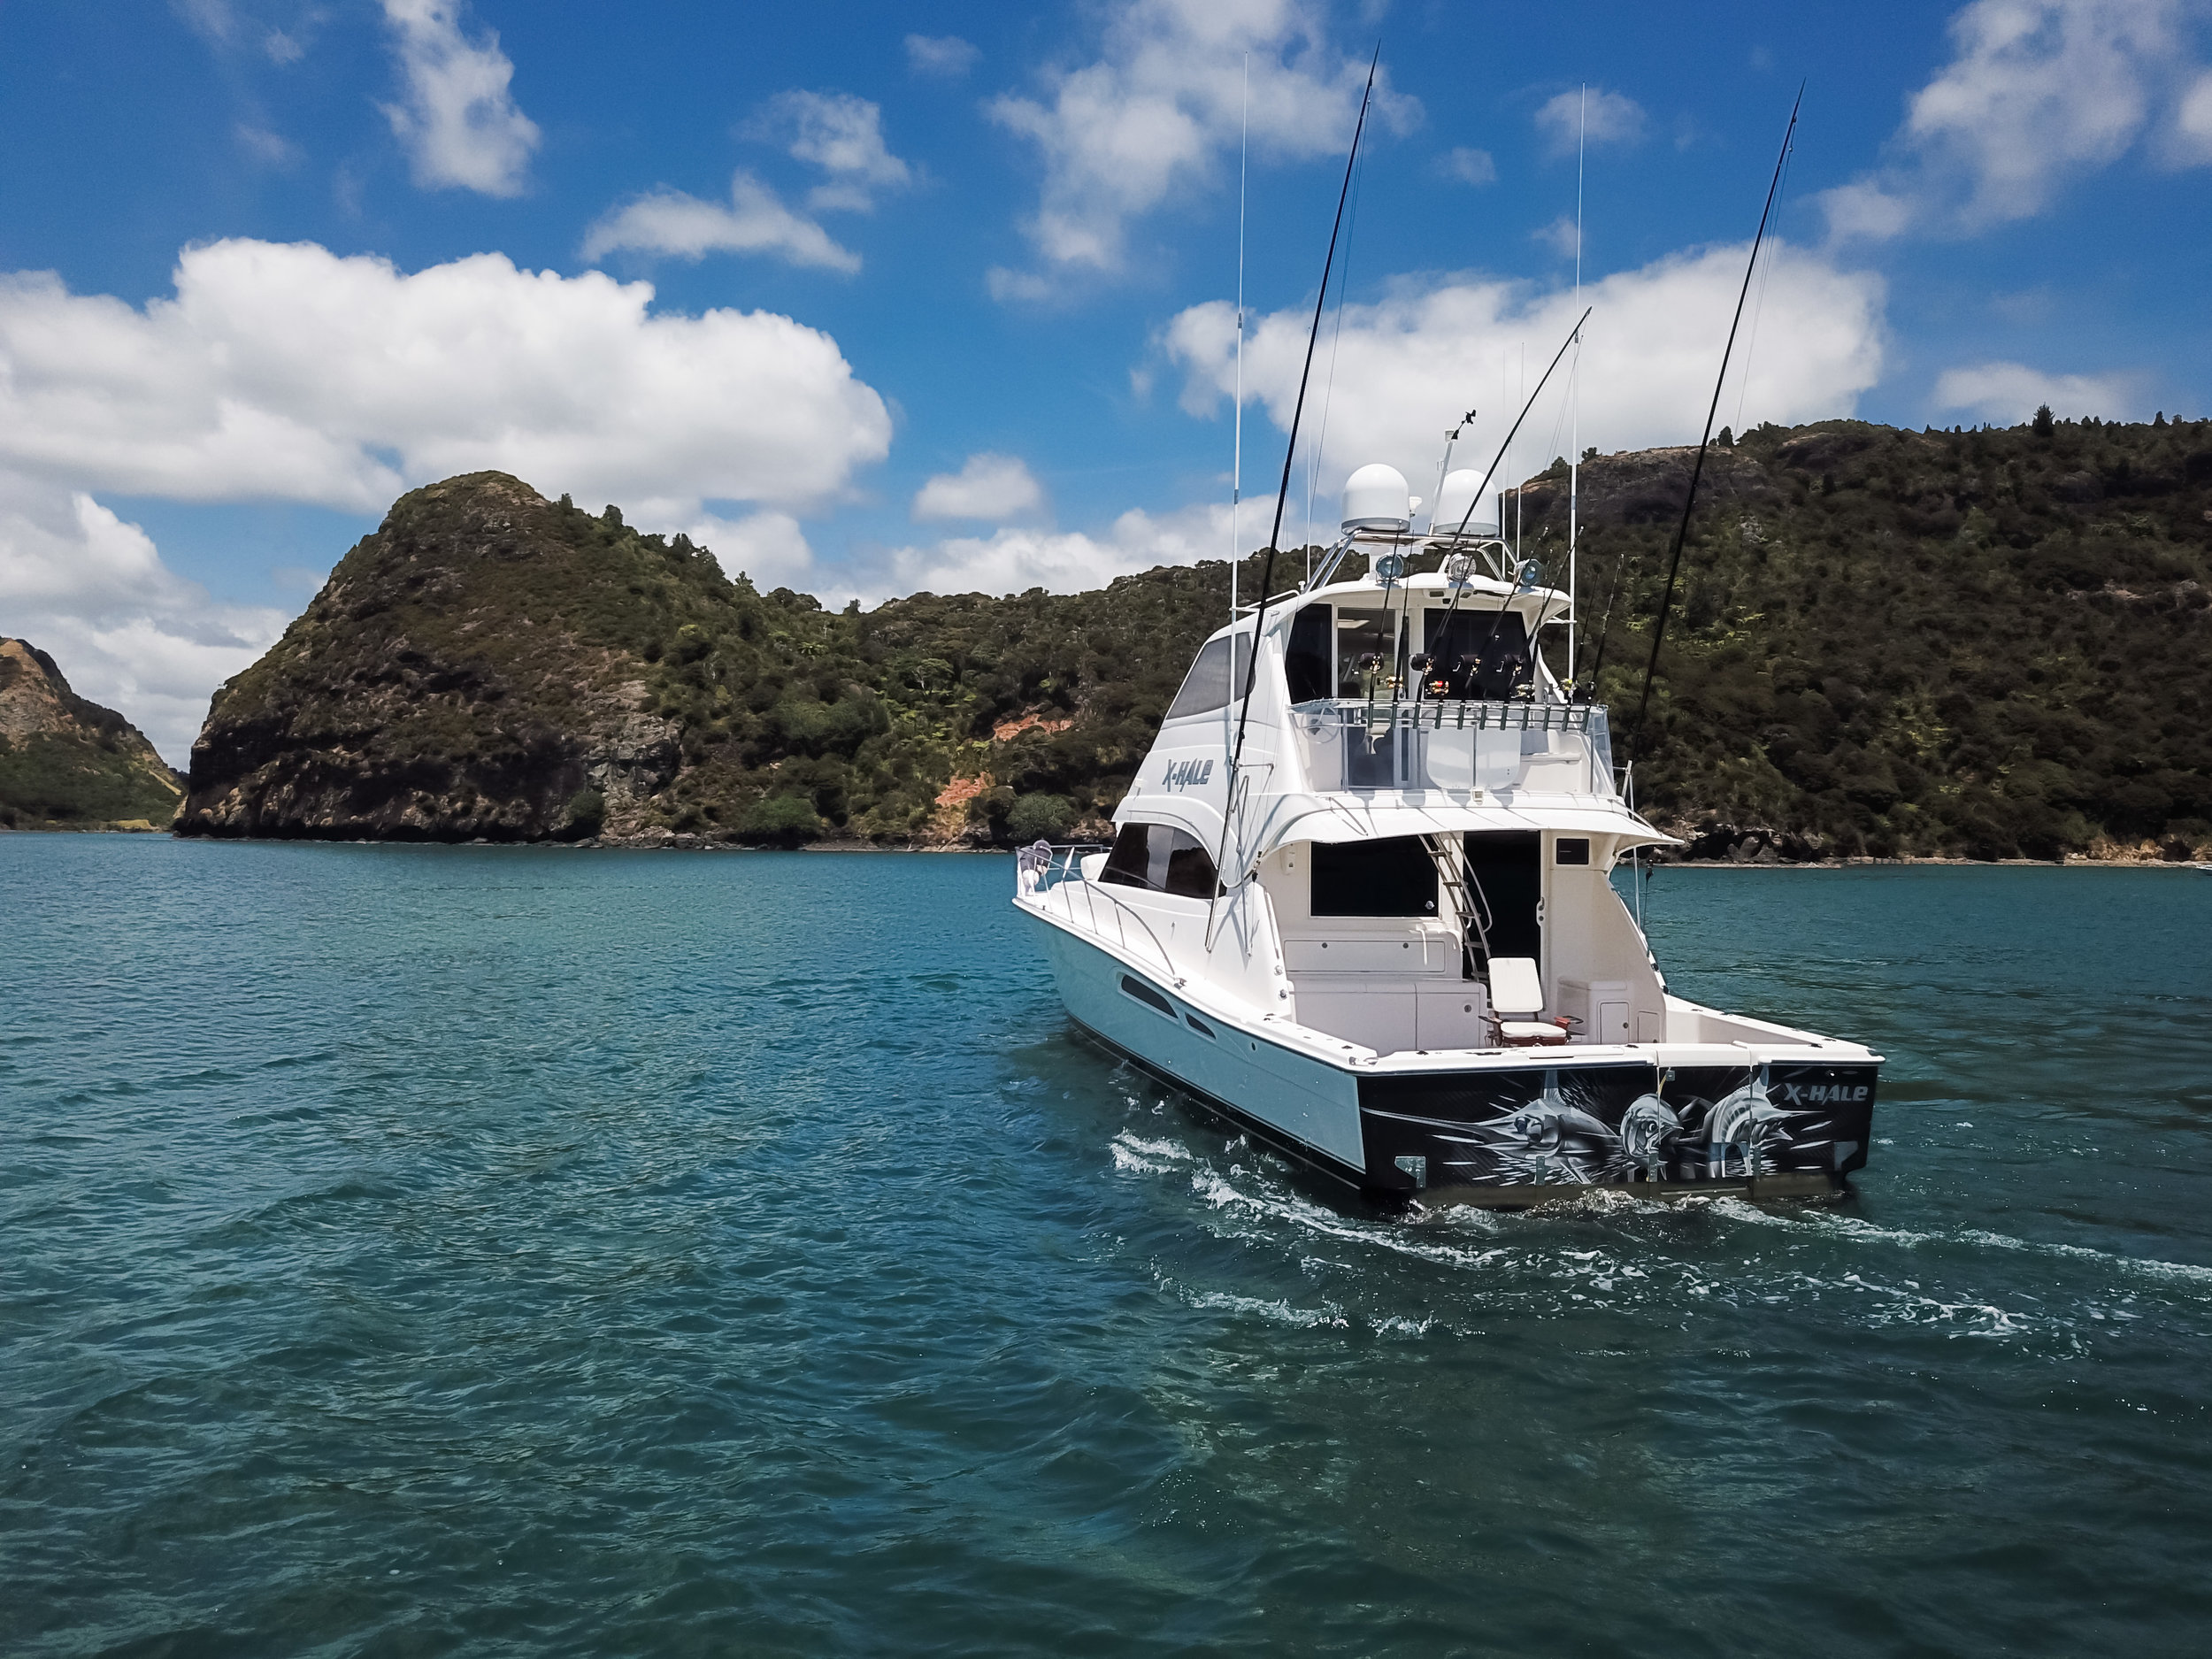 09_Marine Photography NZ.jpg